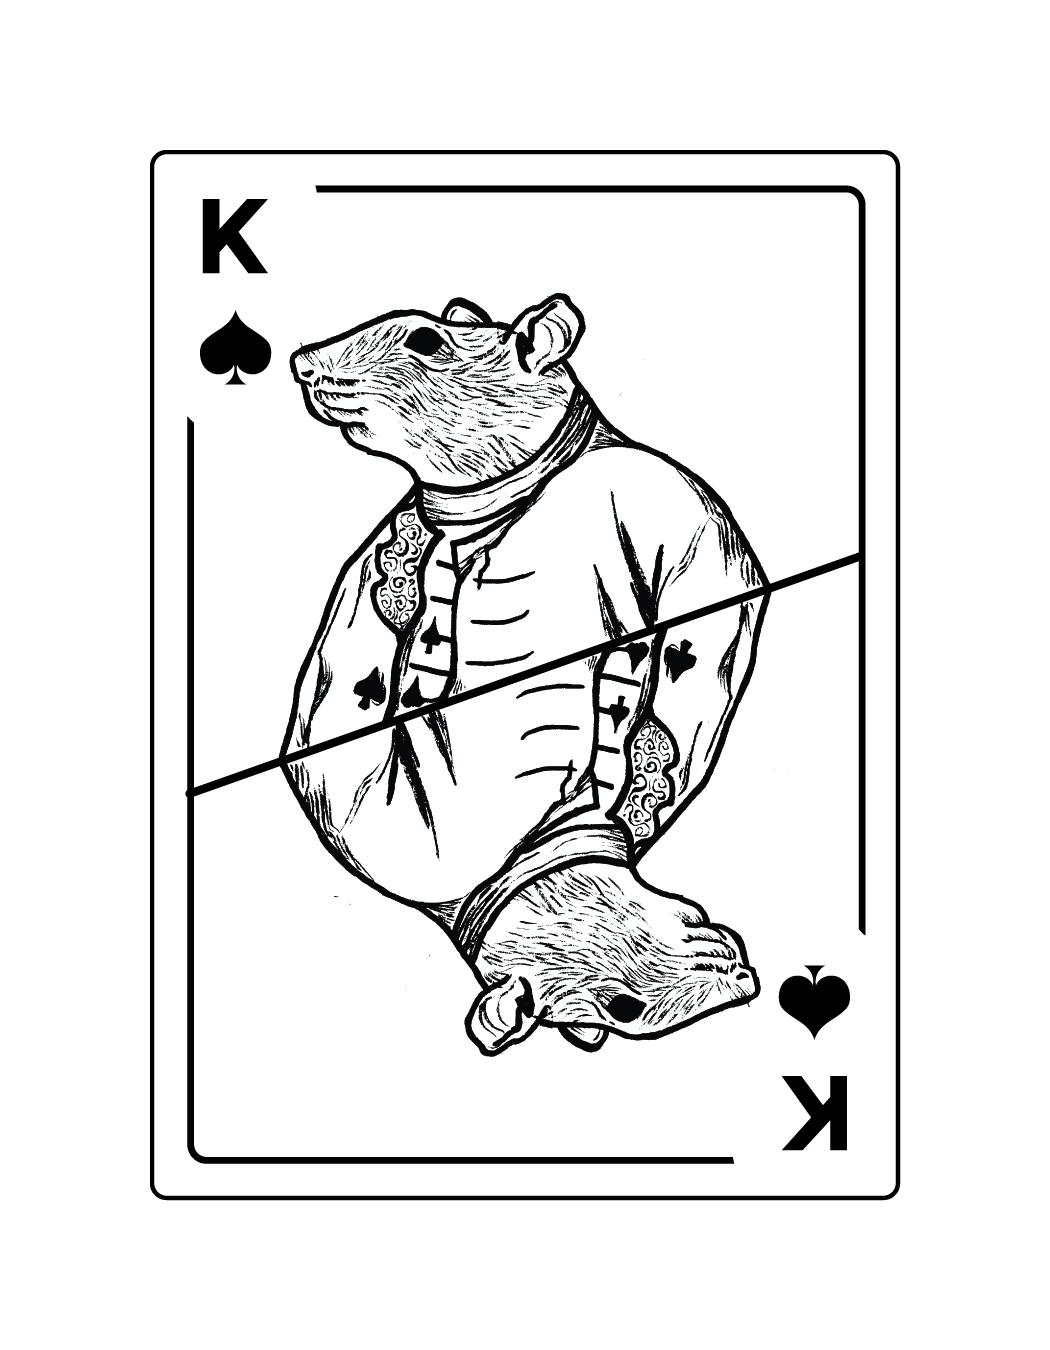 card_draft_1-40.jpg